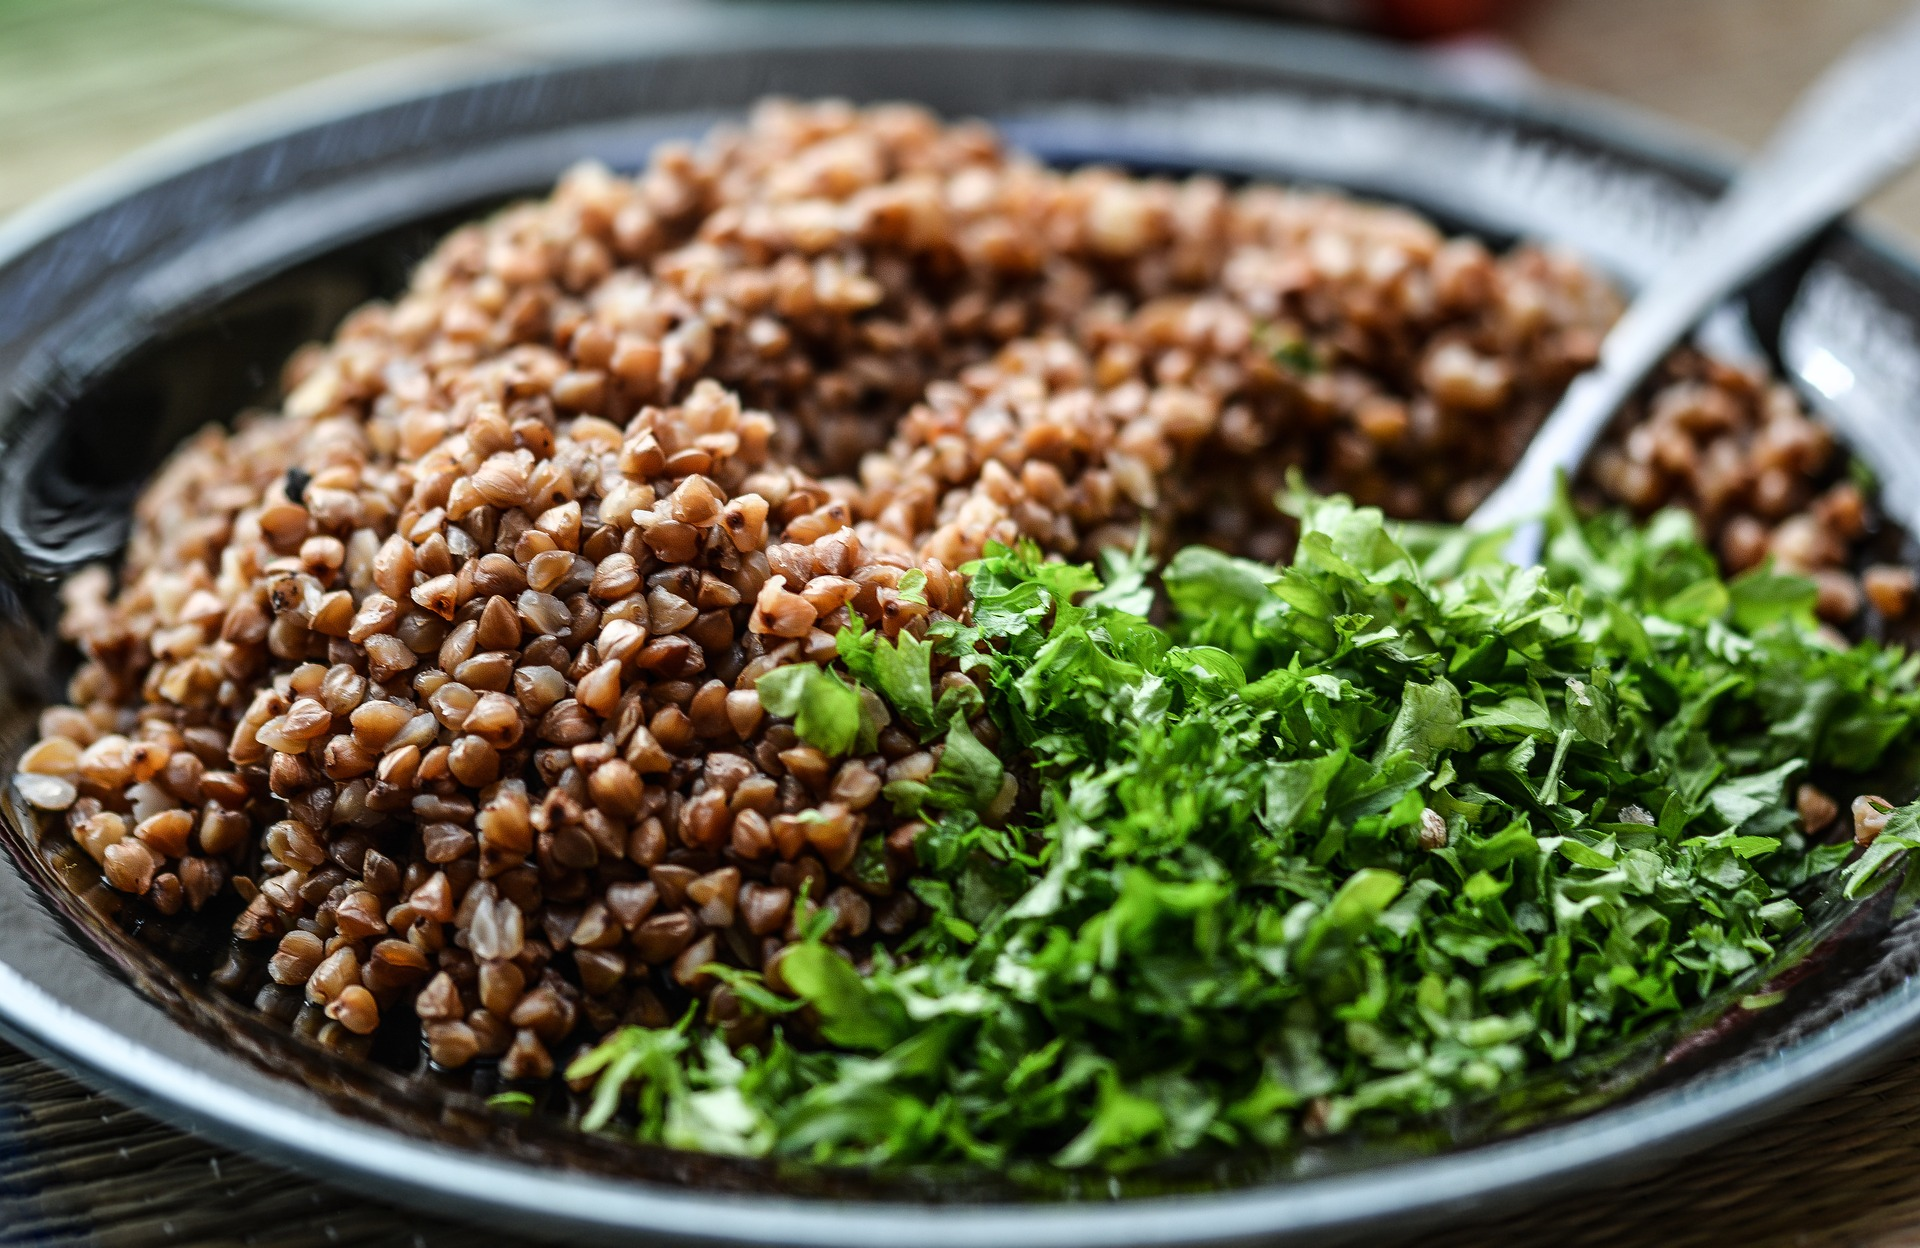 Receptes variades sense gluten